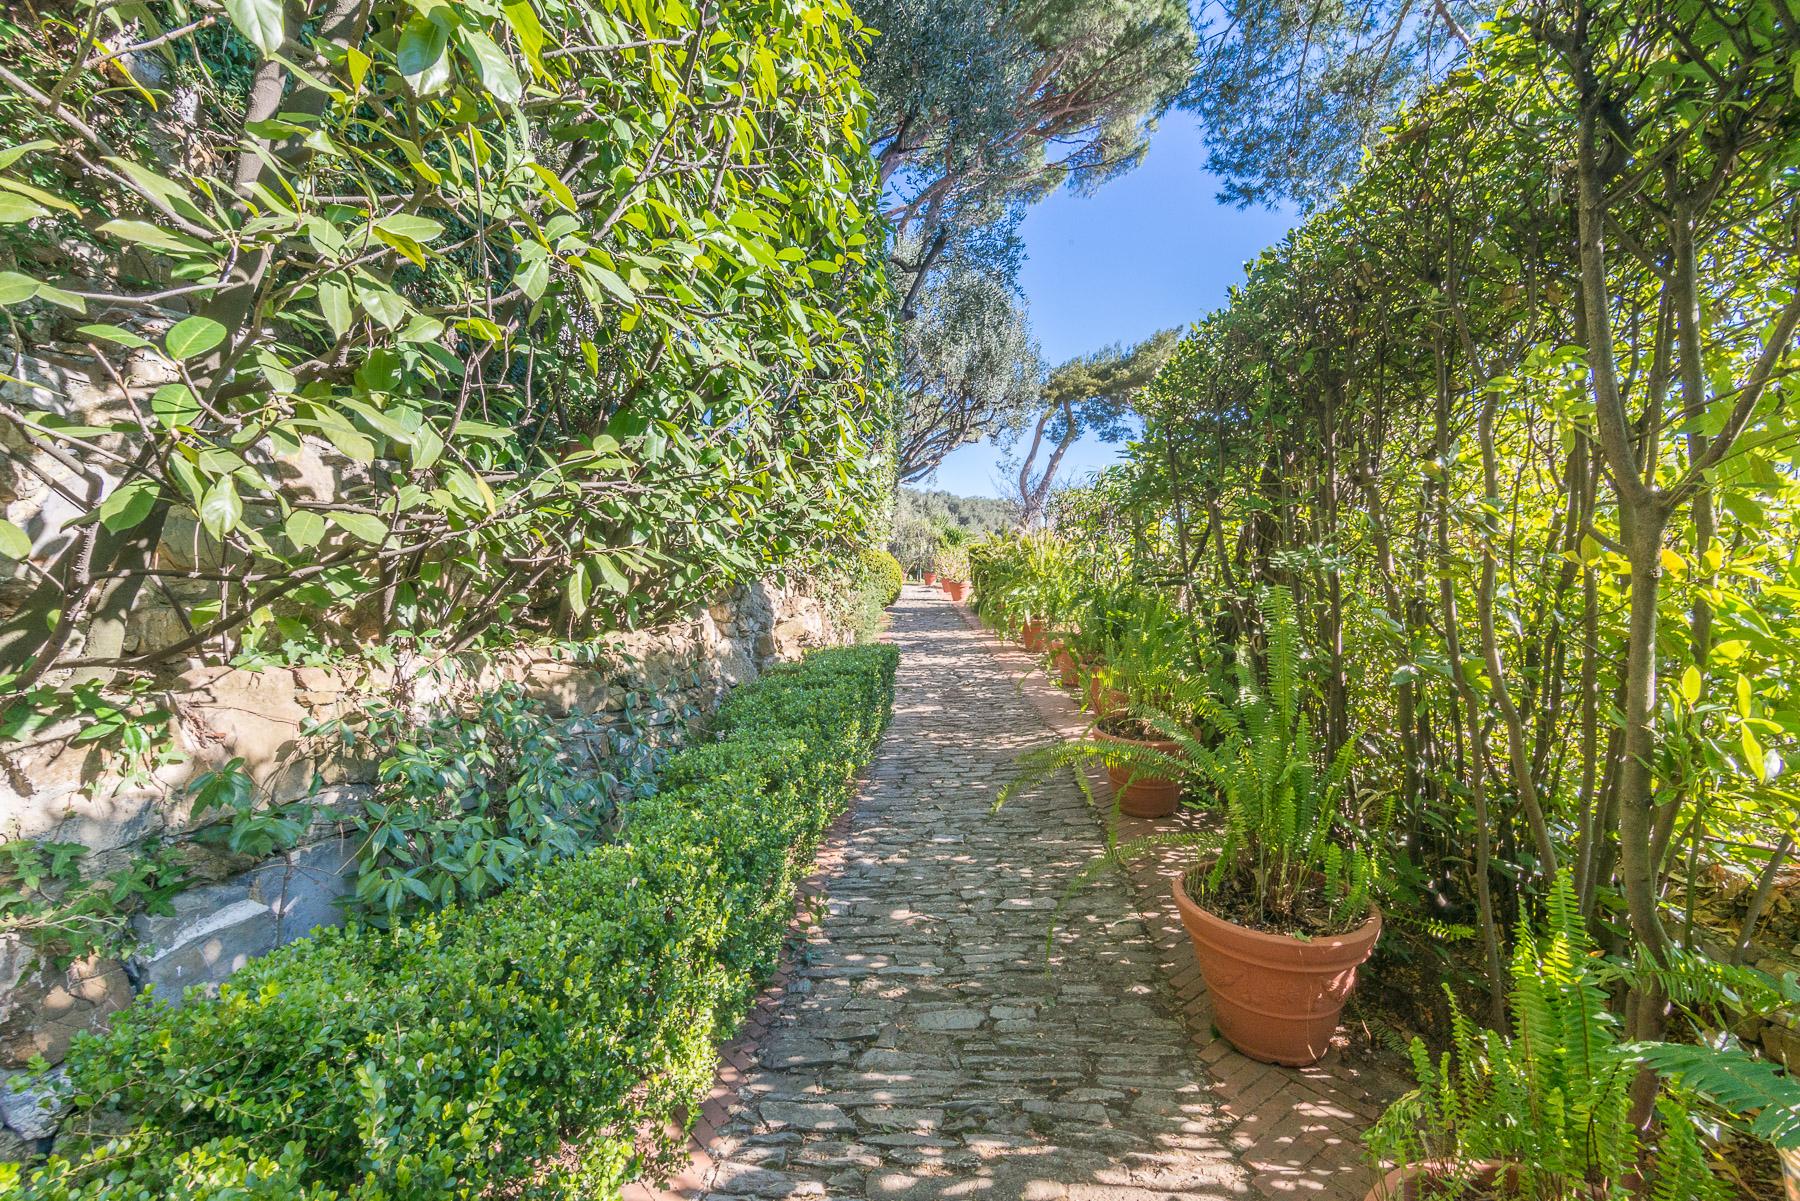 Villa in Vendita a Santa Margherita Ligure: 5 locali, 440 mq - Foto 16